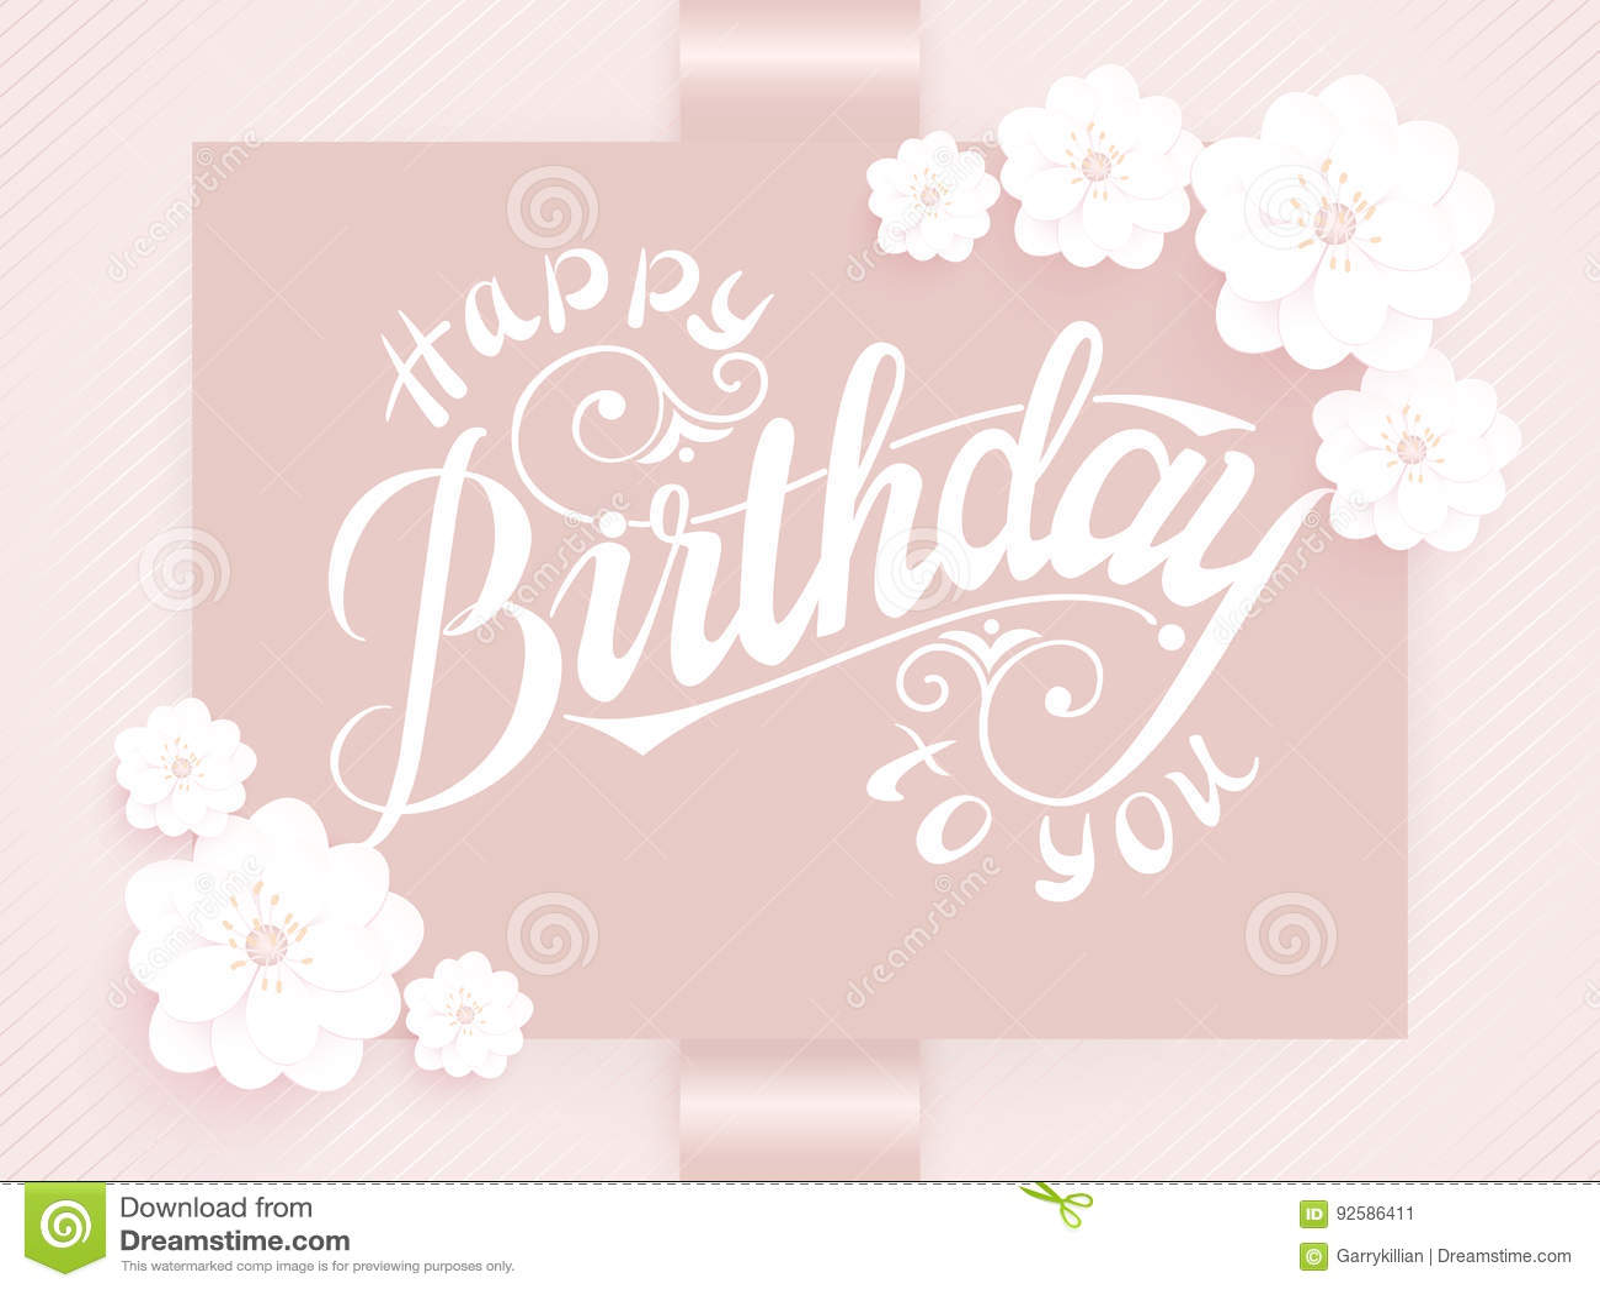 Elegant Vector Happy Birthday To You Card Vector Invitation Card